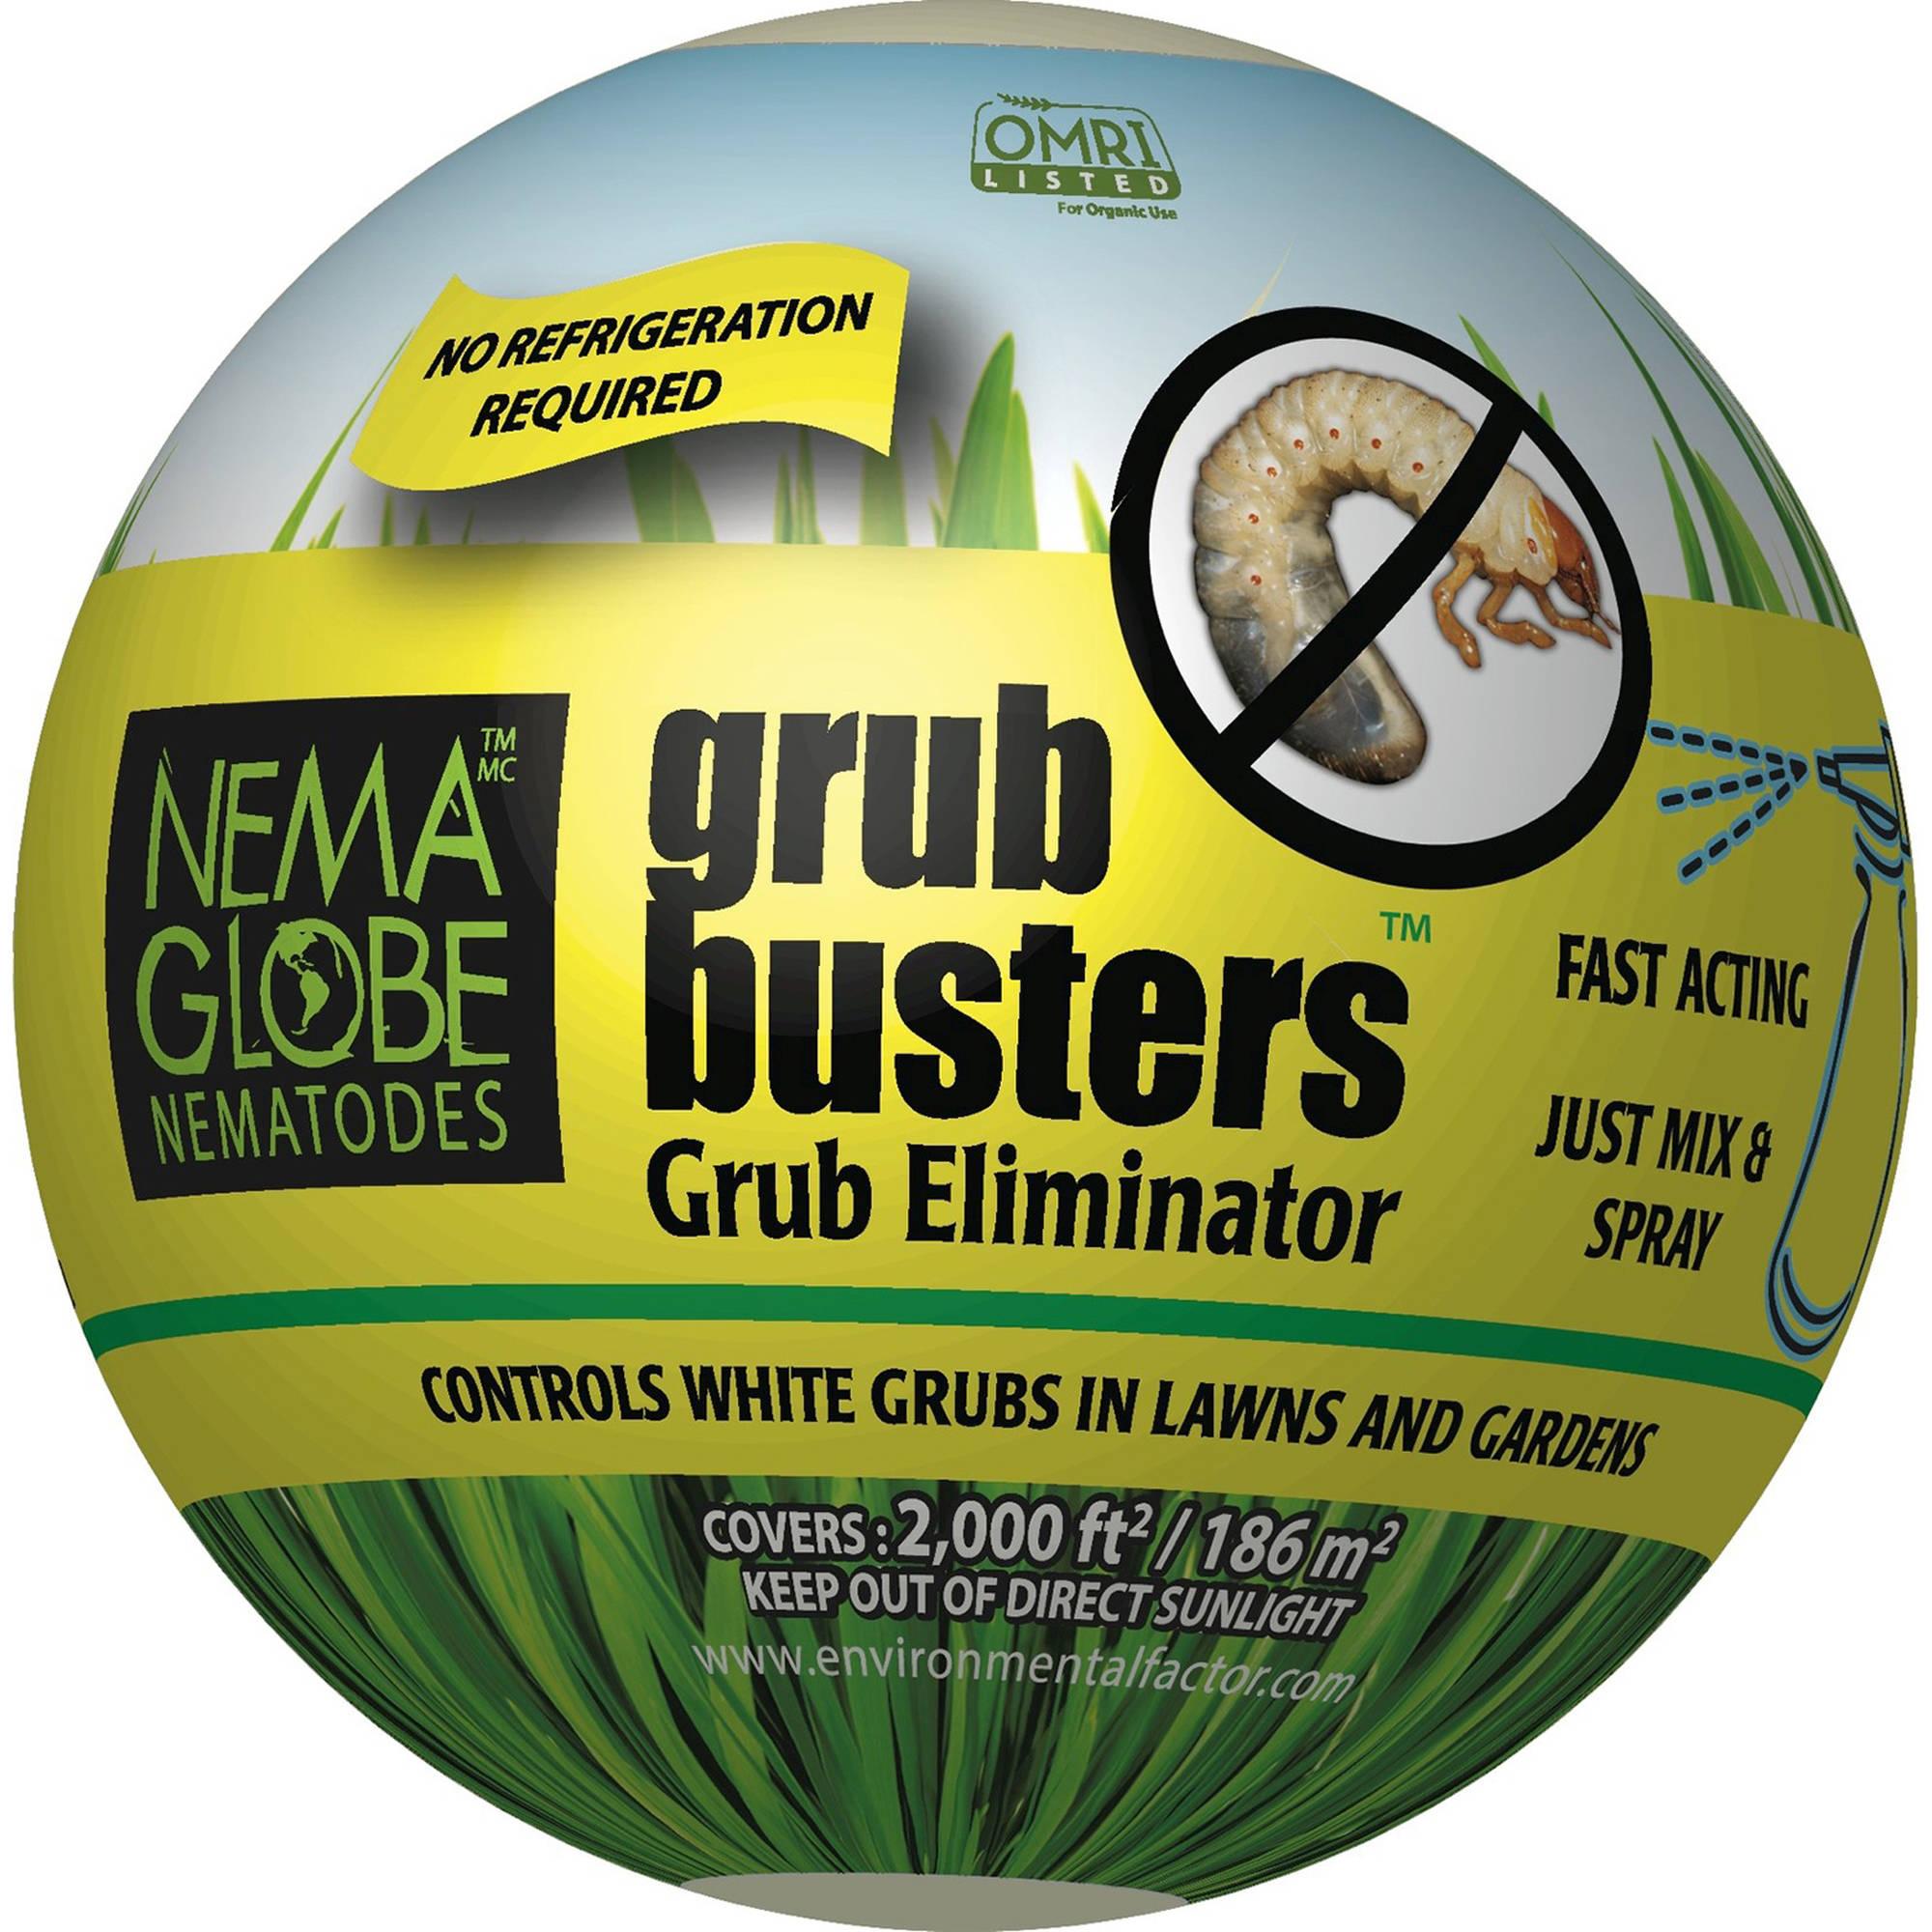 Nema Globe Nematodes 4003000 3000 Sq Ft Grub Busters Grub and Flea Control